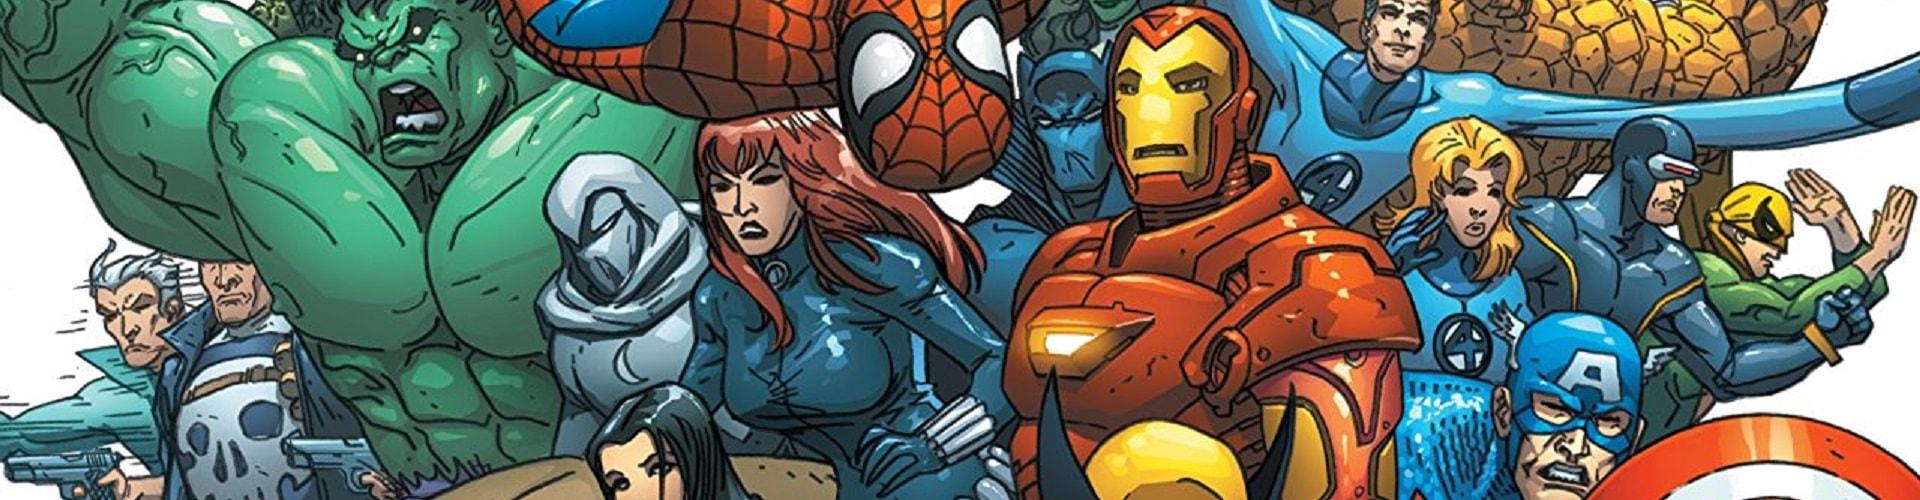 on sale this week: marvel team-up